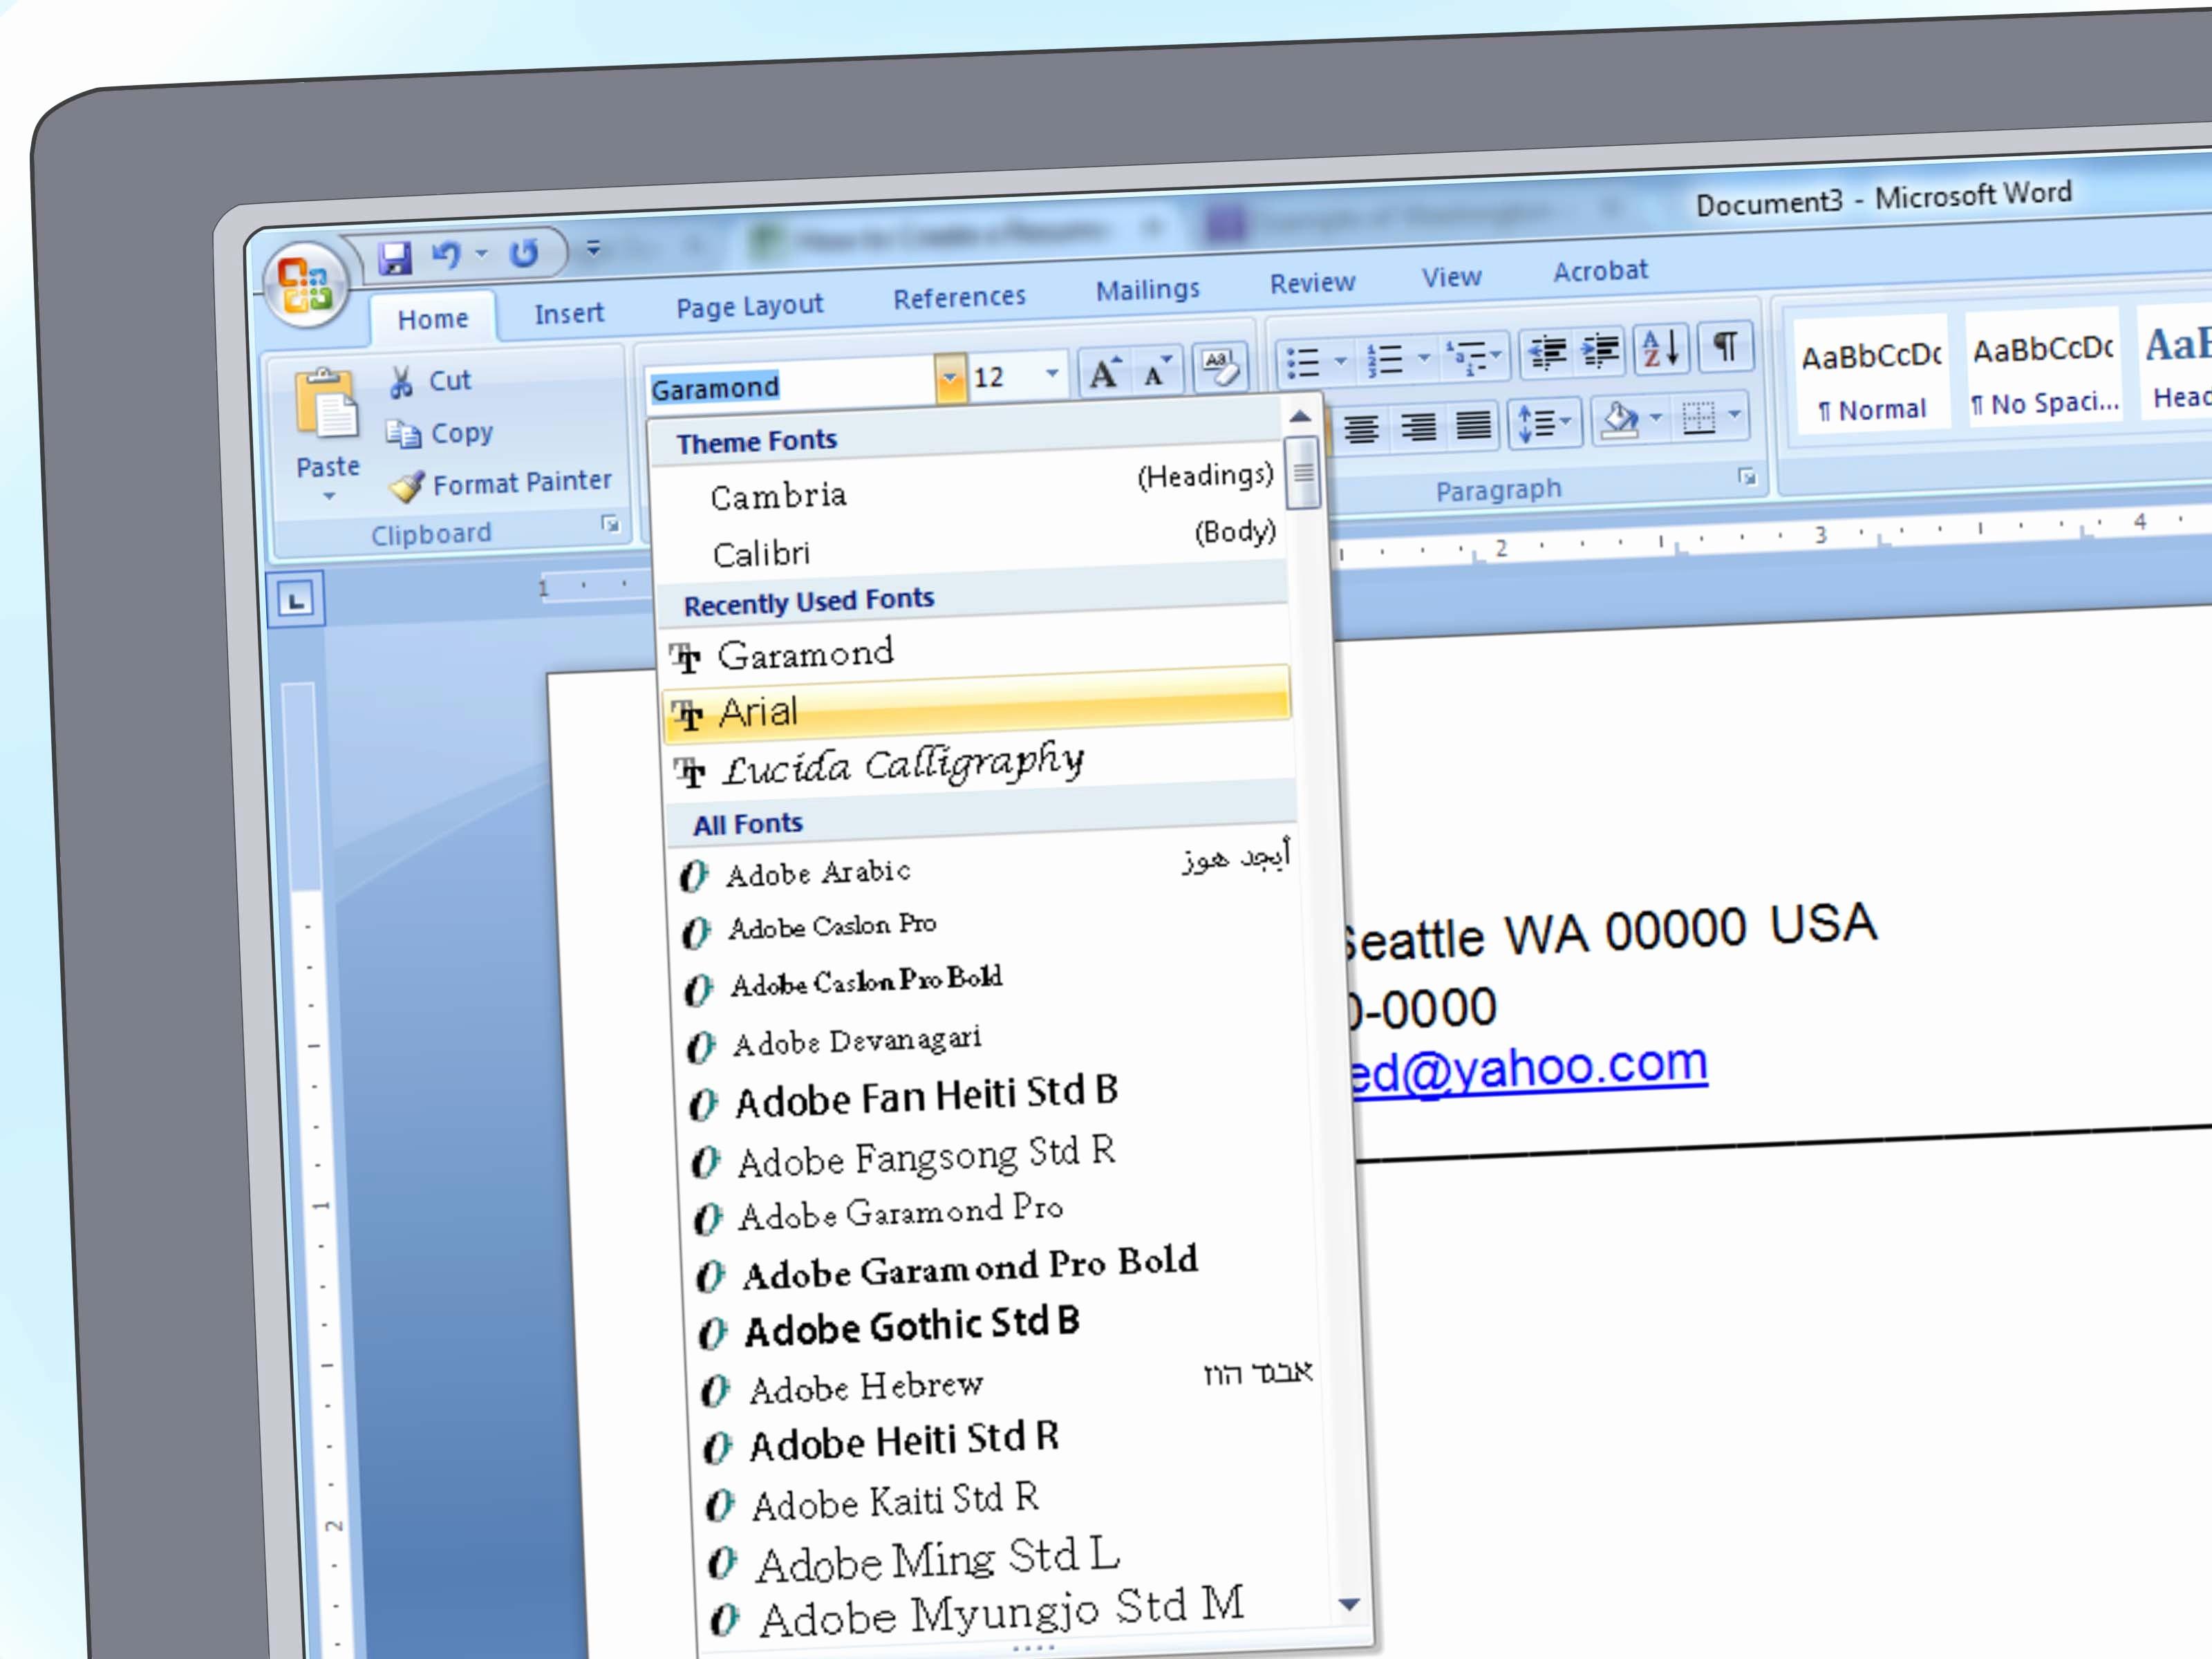 Resume Templates Microsoft Word 2010 Inspirational Free Microsoft Fice 2010 Resume Templates Bongdaao